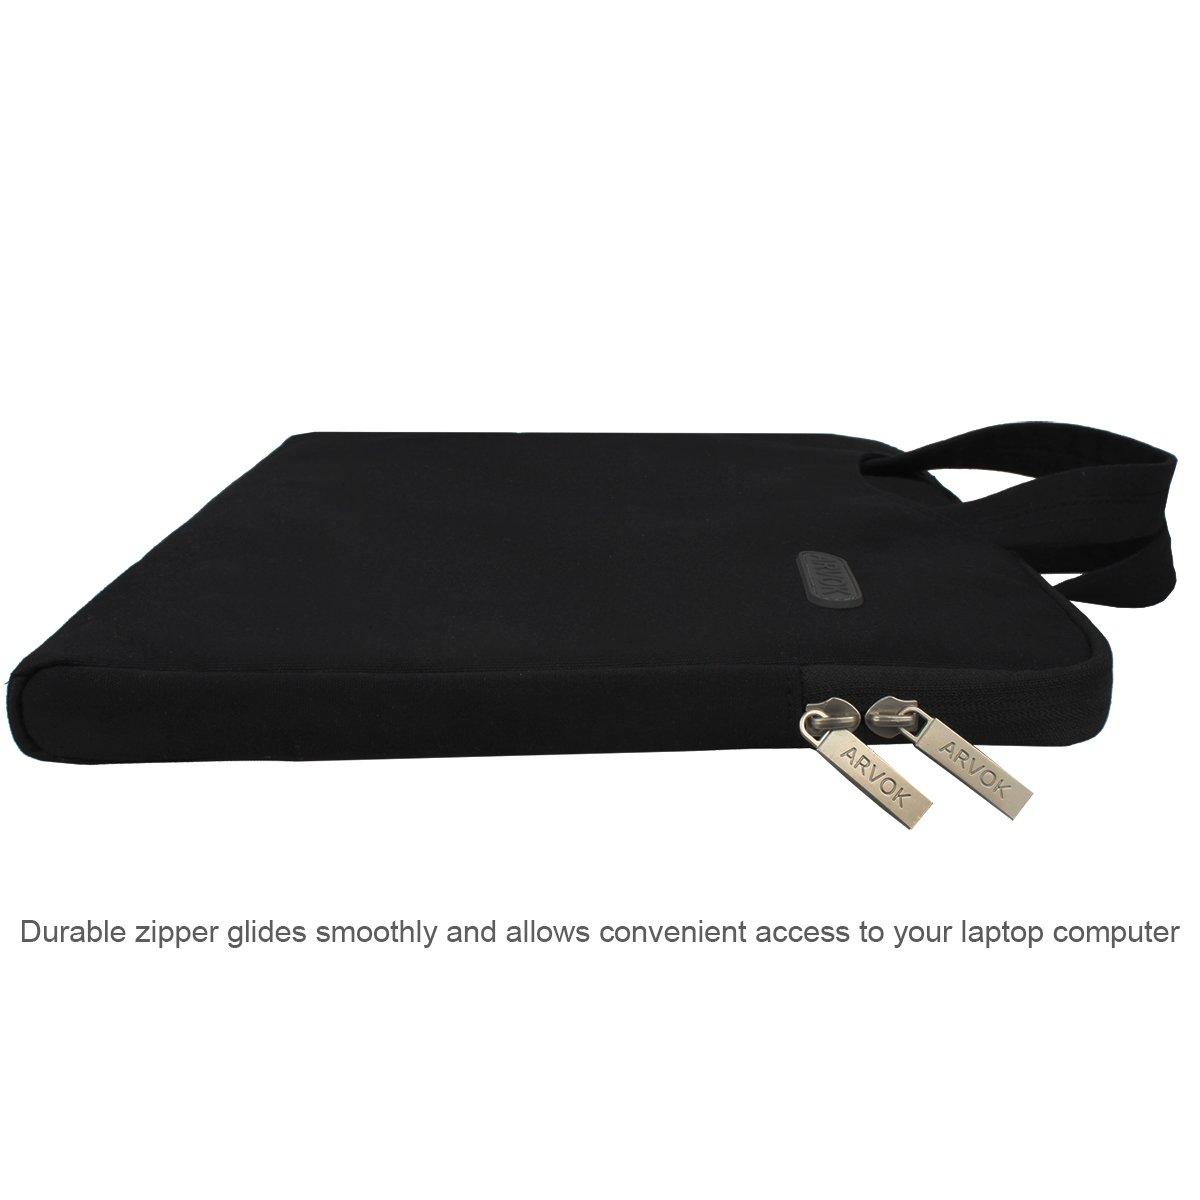 Arvok 15 15.6 Inch Multi-Color & Size Water-resistant Laptop Sleeve Bag with Handle/Notebook Computer Case/Ultrabook Briefcase Carrying Bag, Black by ARVOK (Image #6)